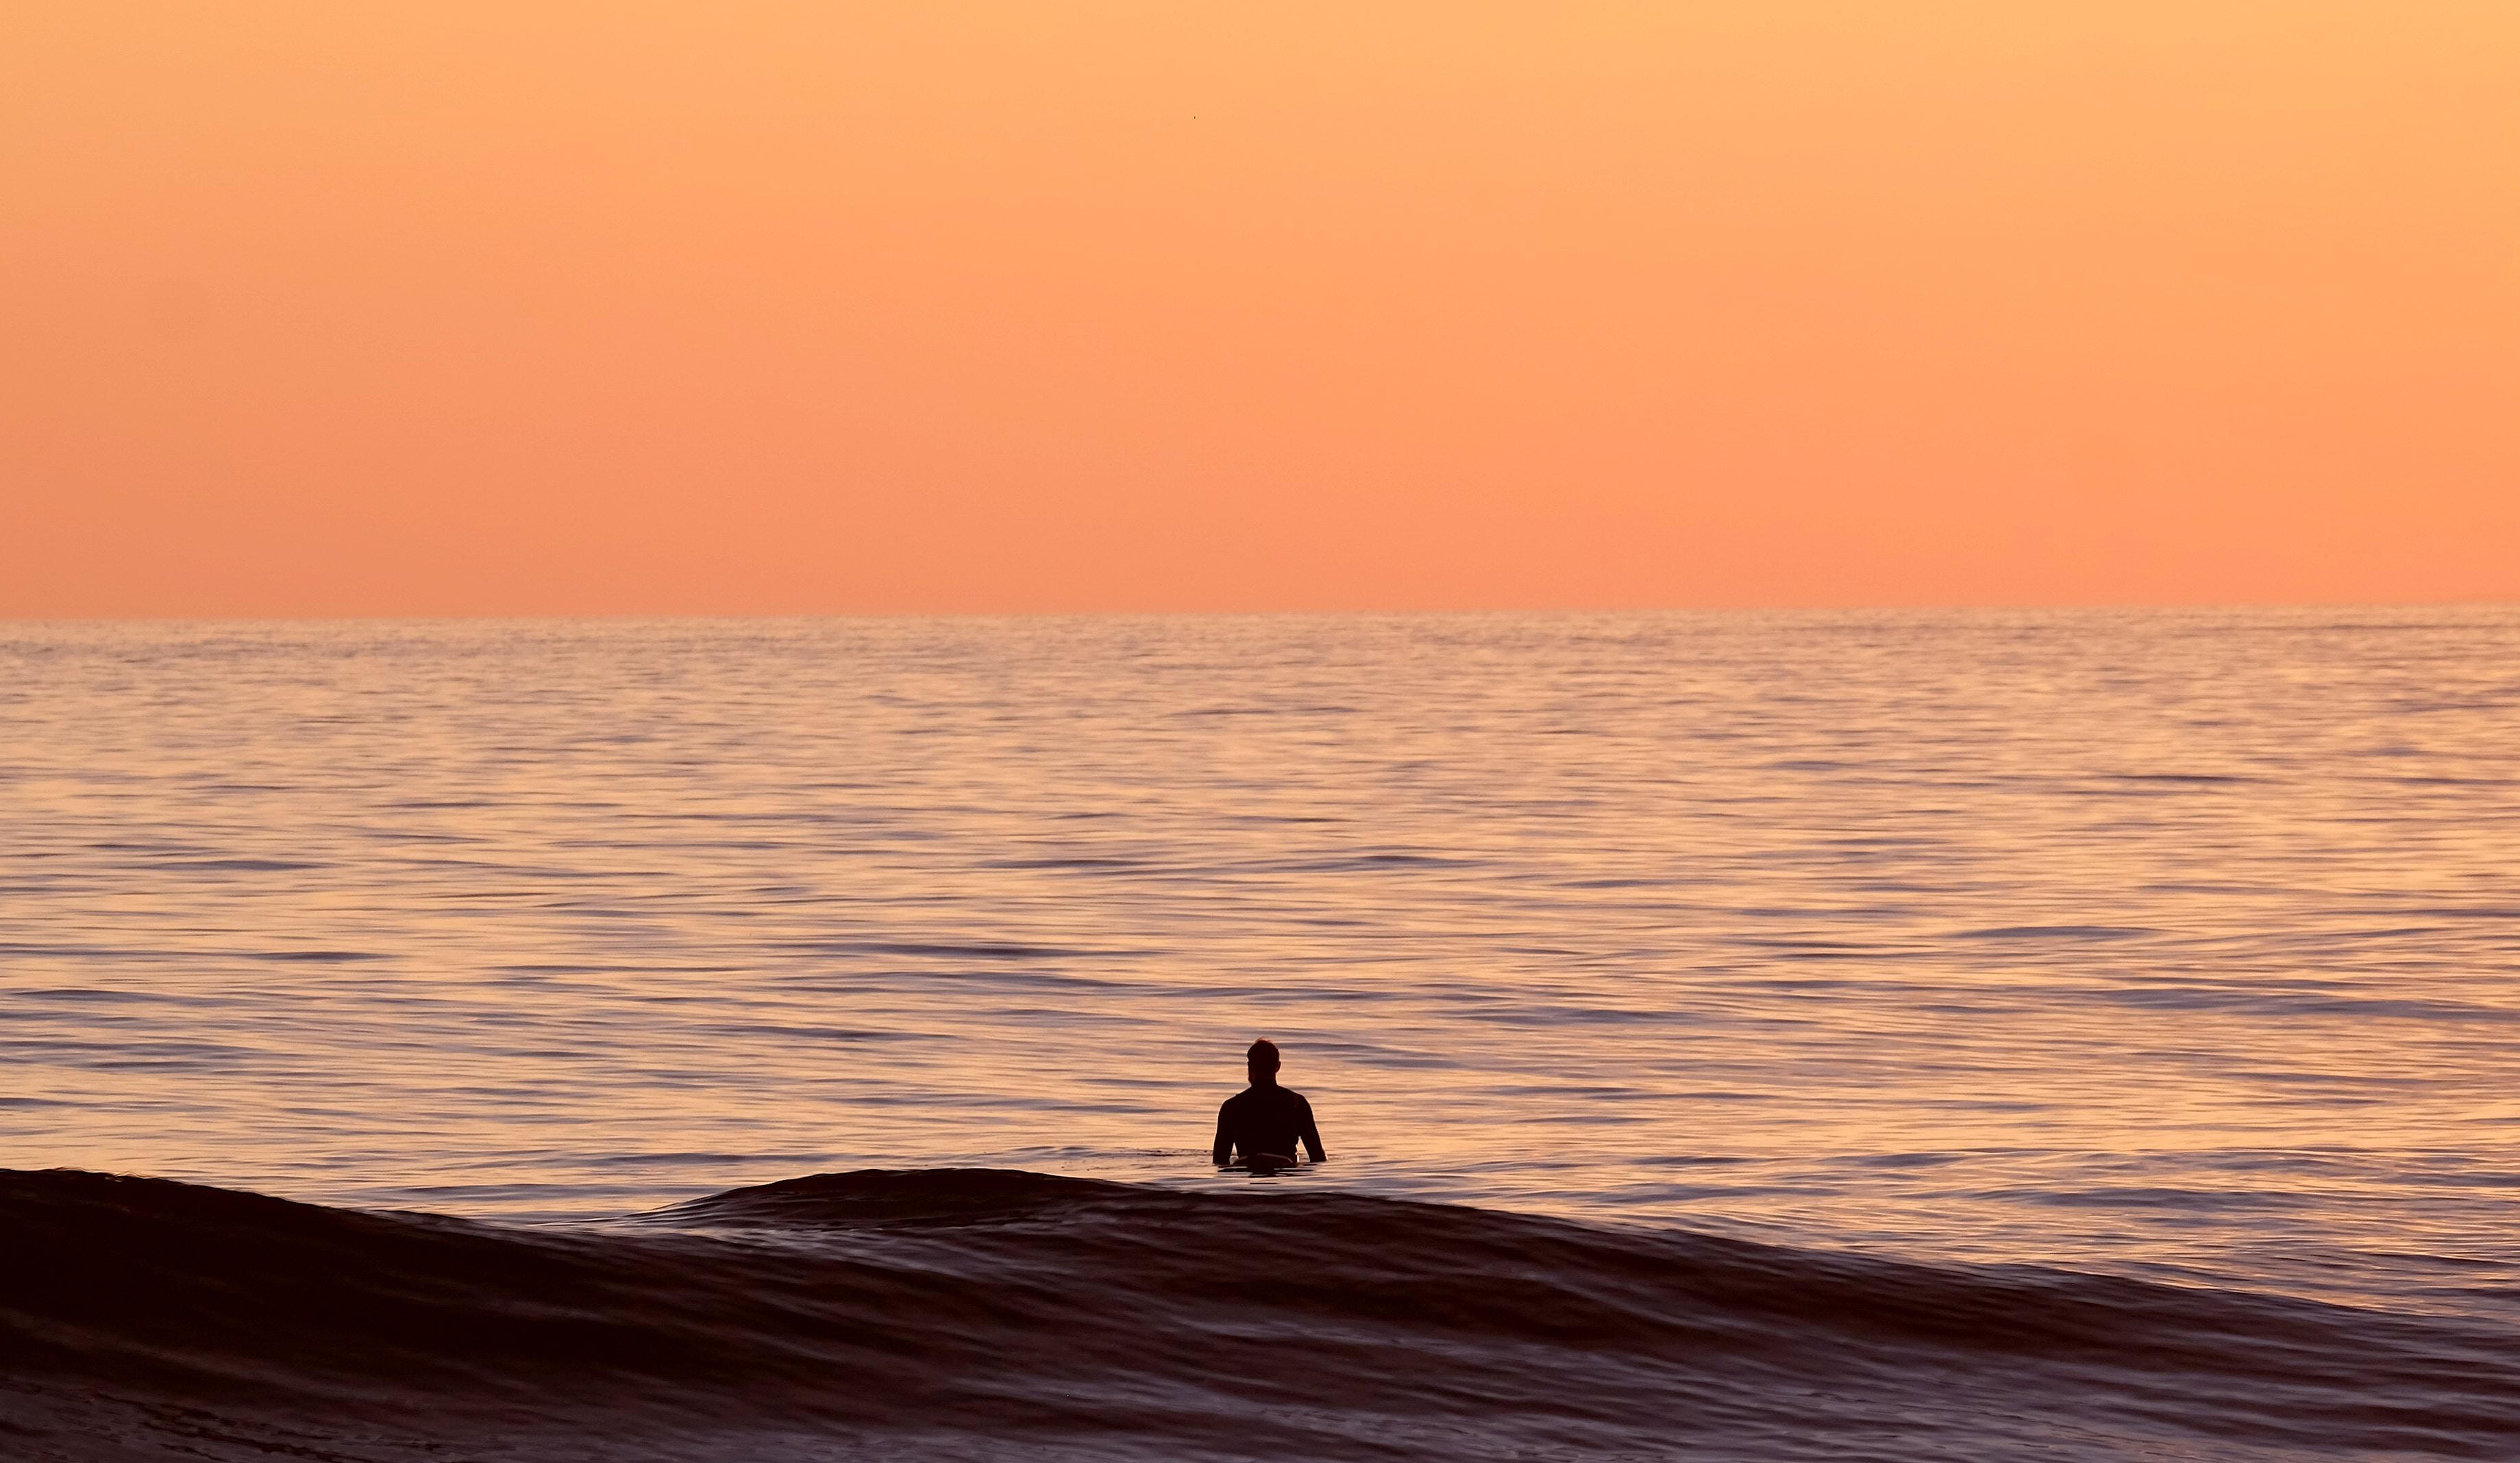 Silhouette of a man waist-deep in the ocean under an orange sky